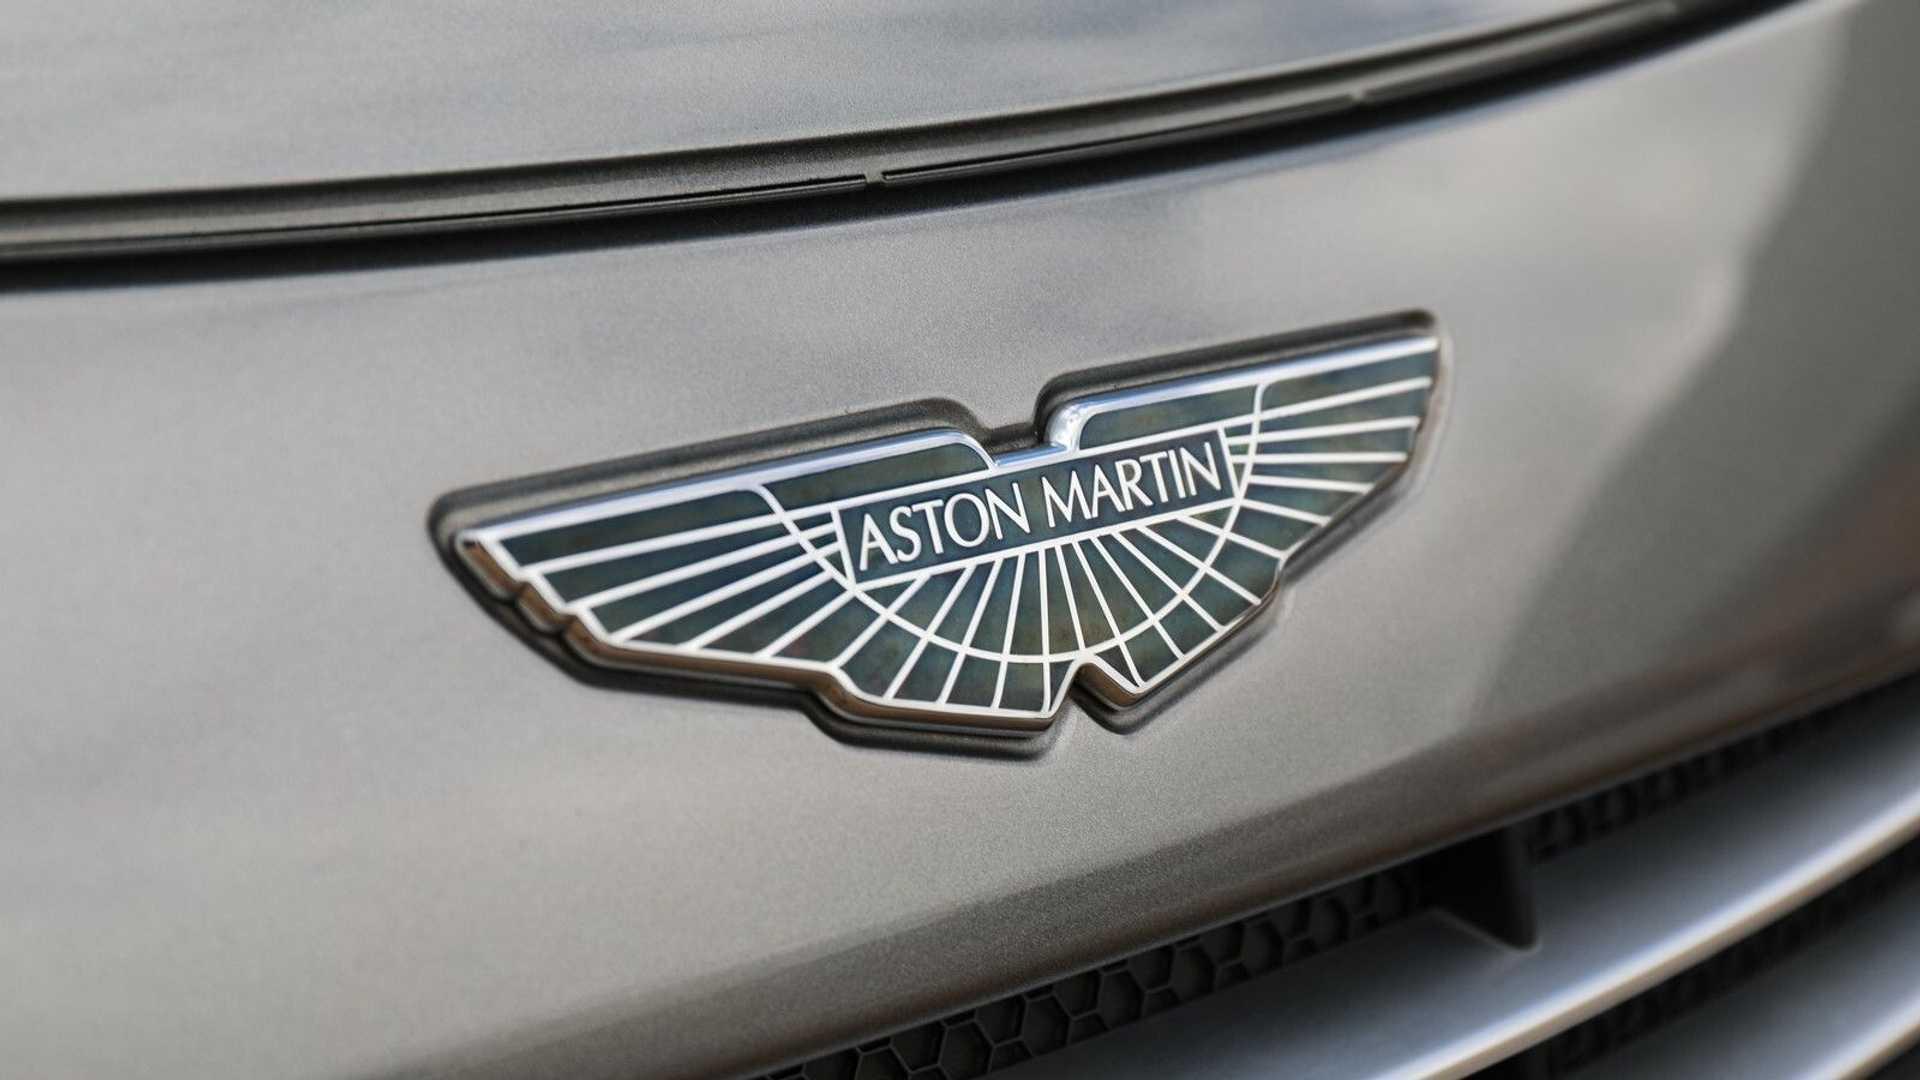 Saham Meningkat Mercedes Benz Beri Aston Martin Akses Teknologi